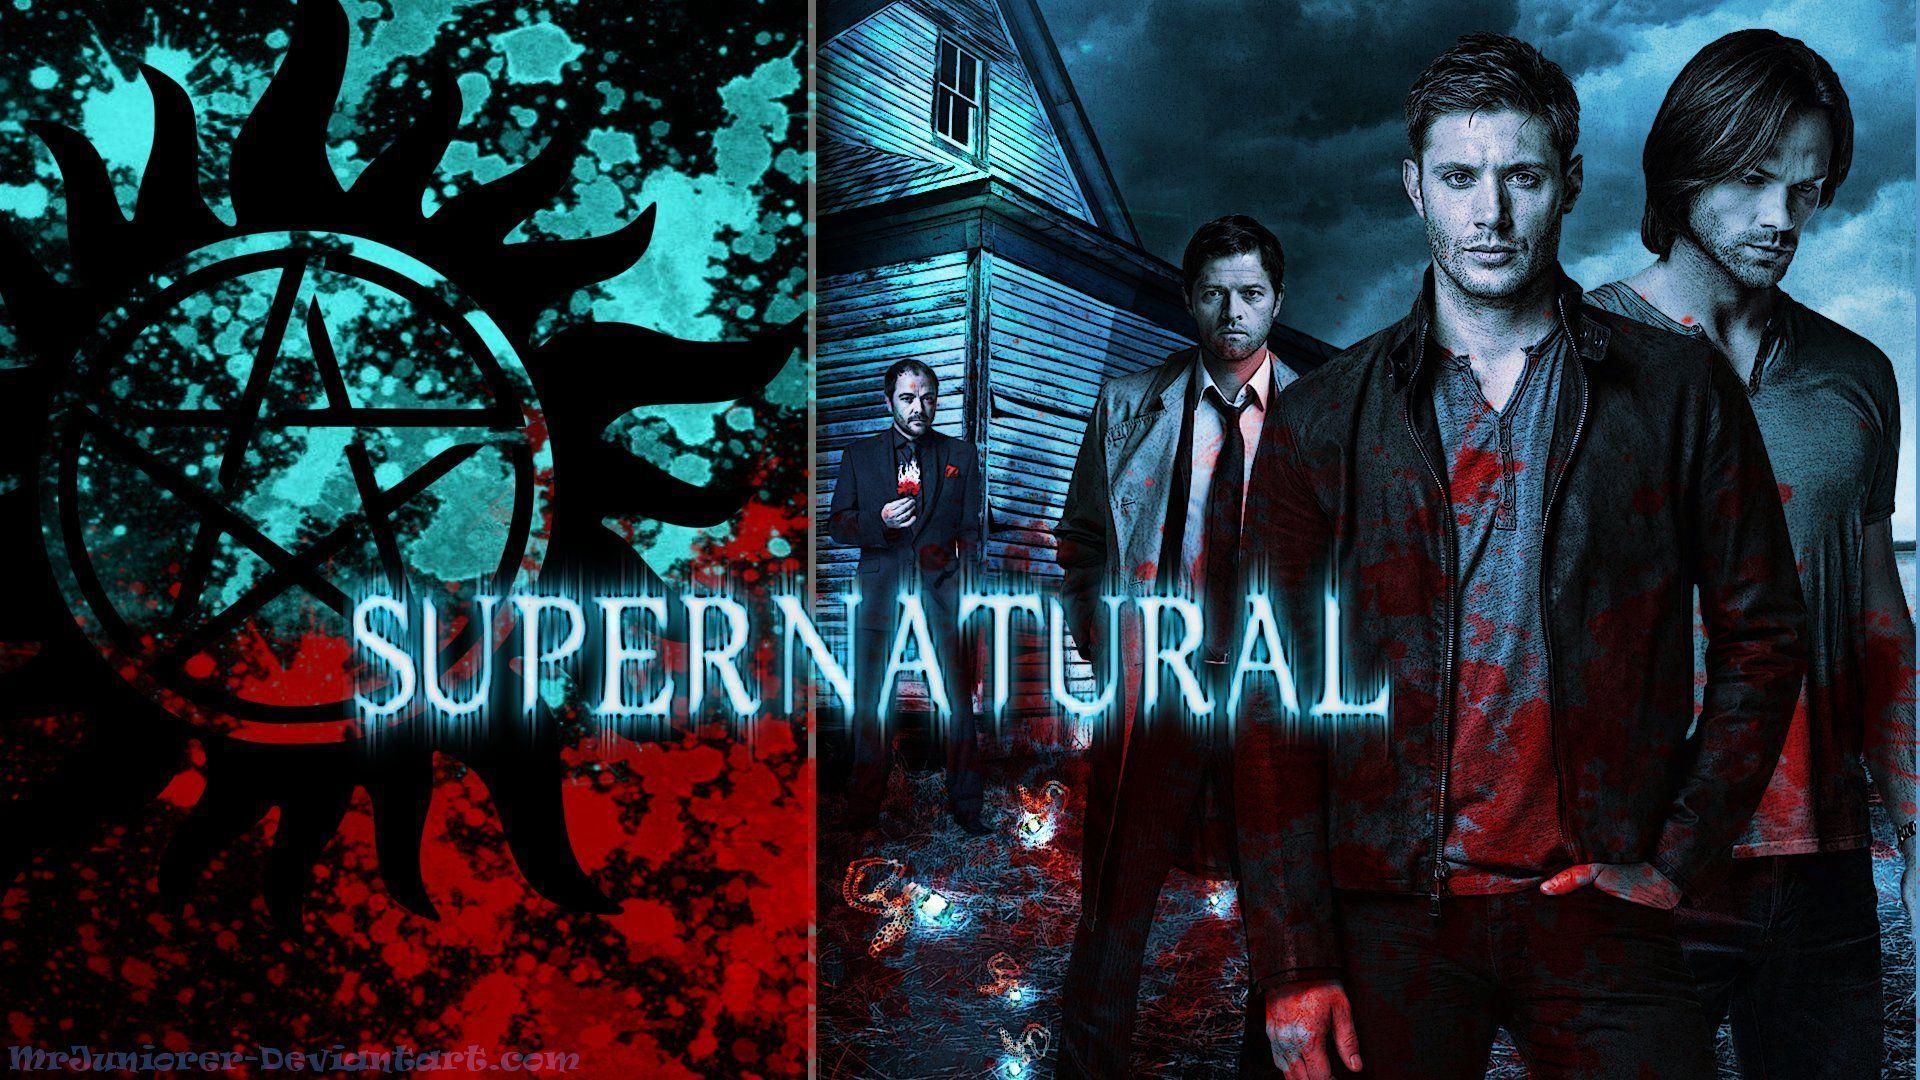 Supernatural Supernatural wallpaper, Supernatural